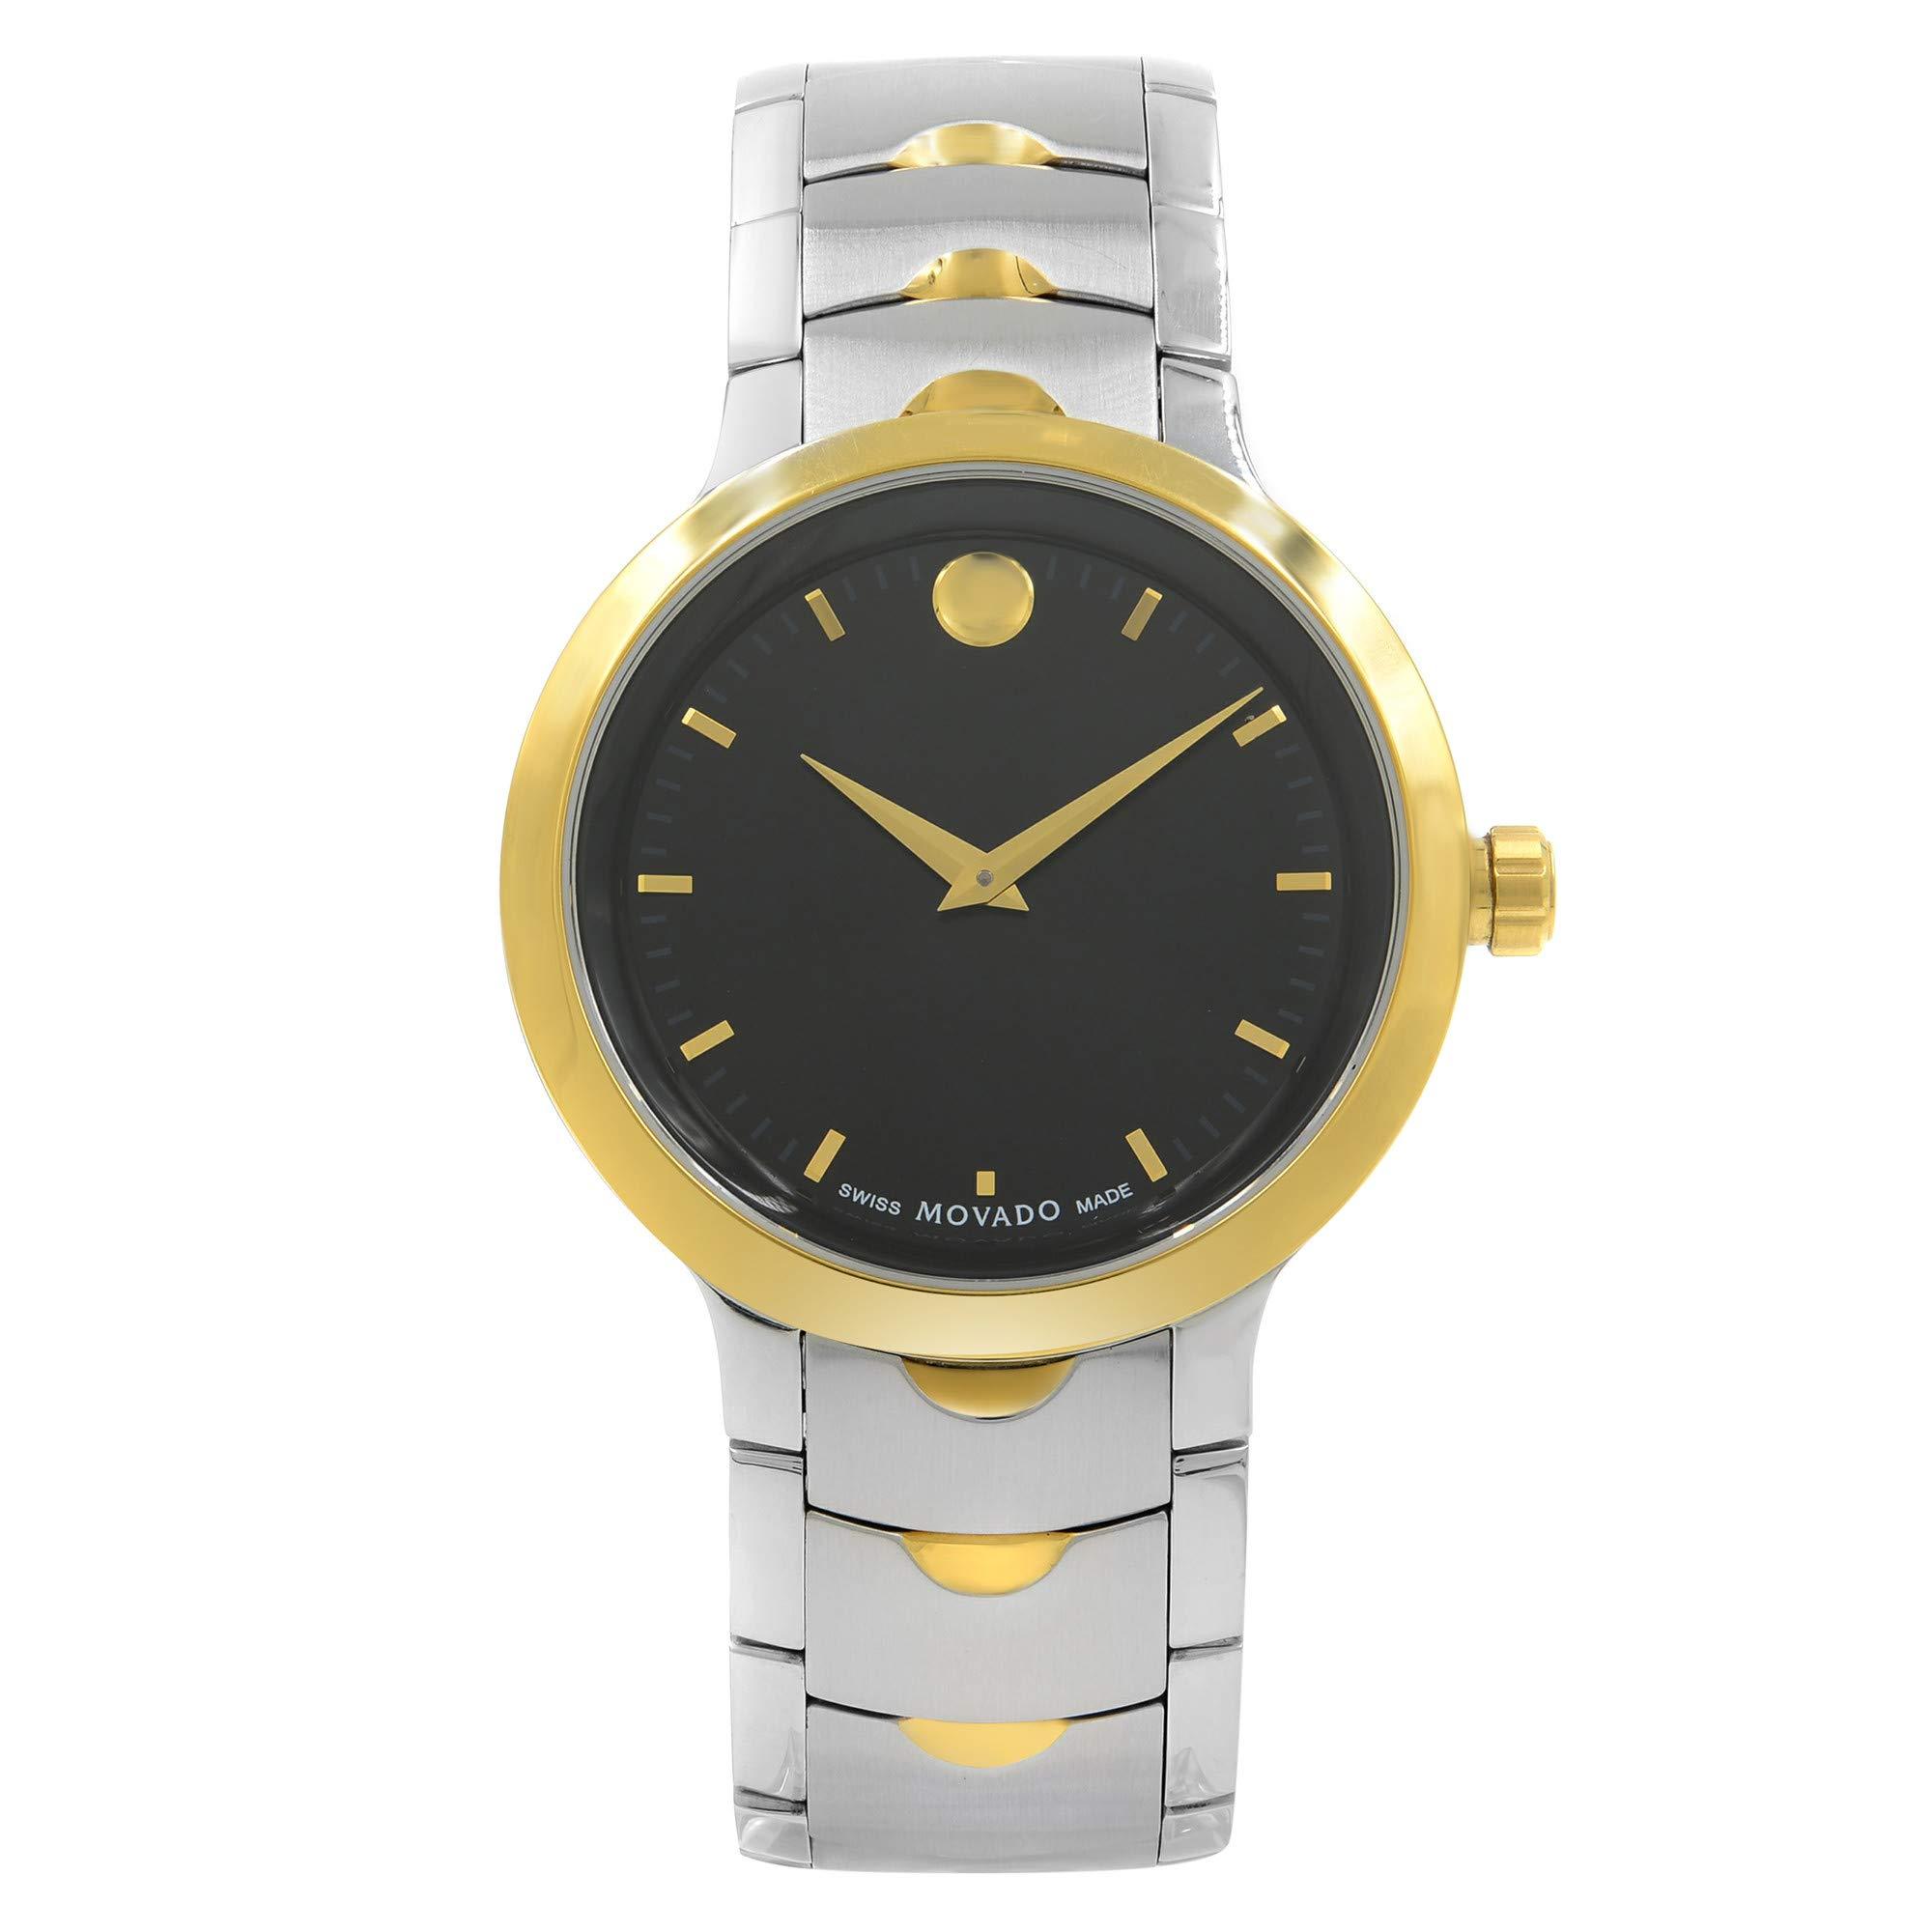 Movado Luno Quartz Male Watch 0607043 (Certified Pre-Owned)